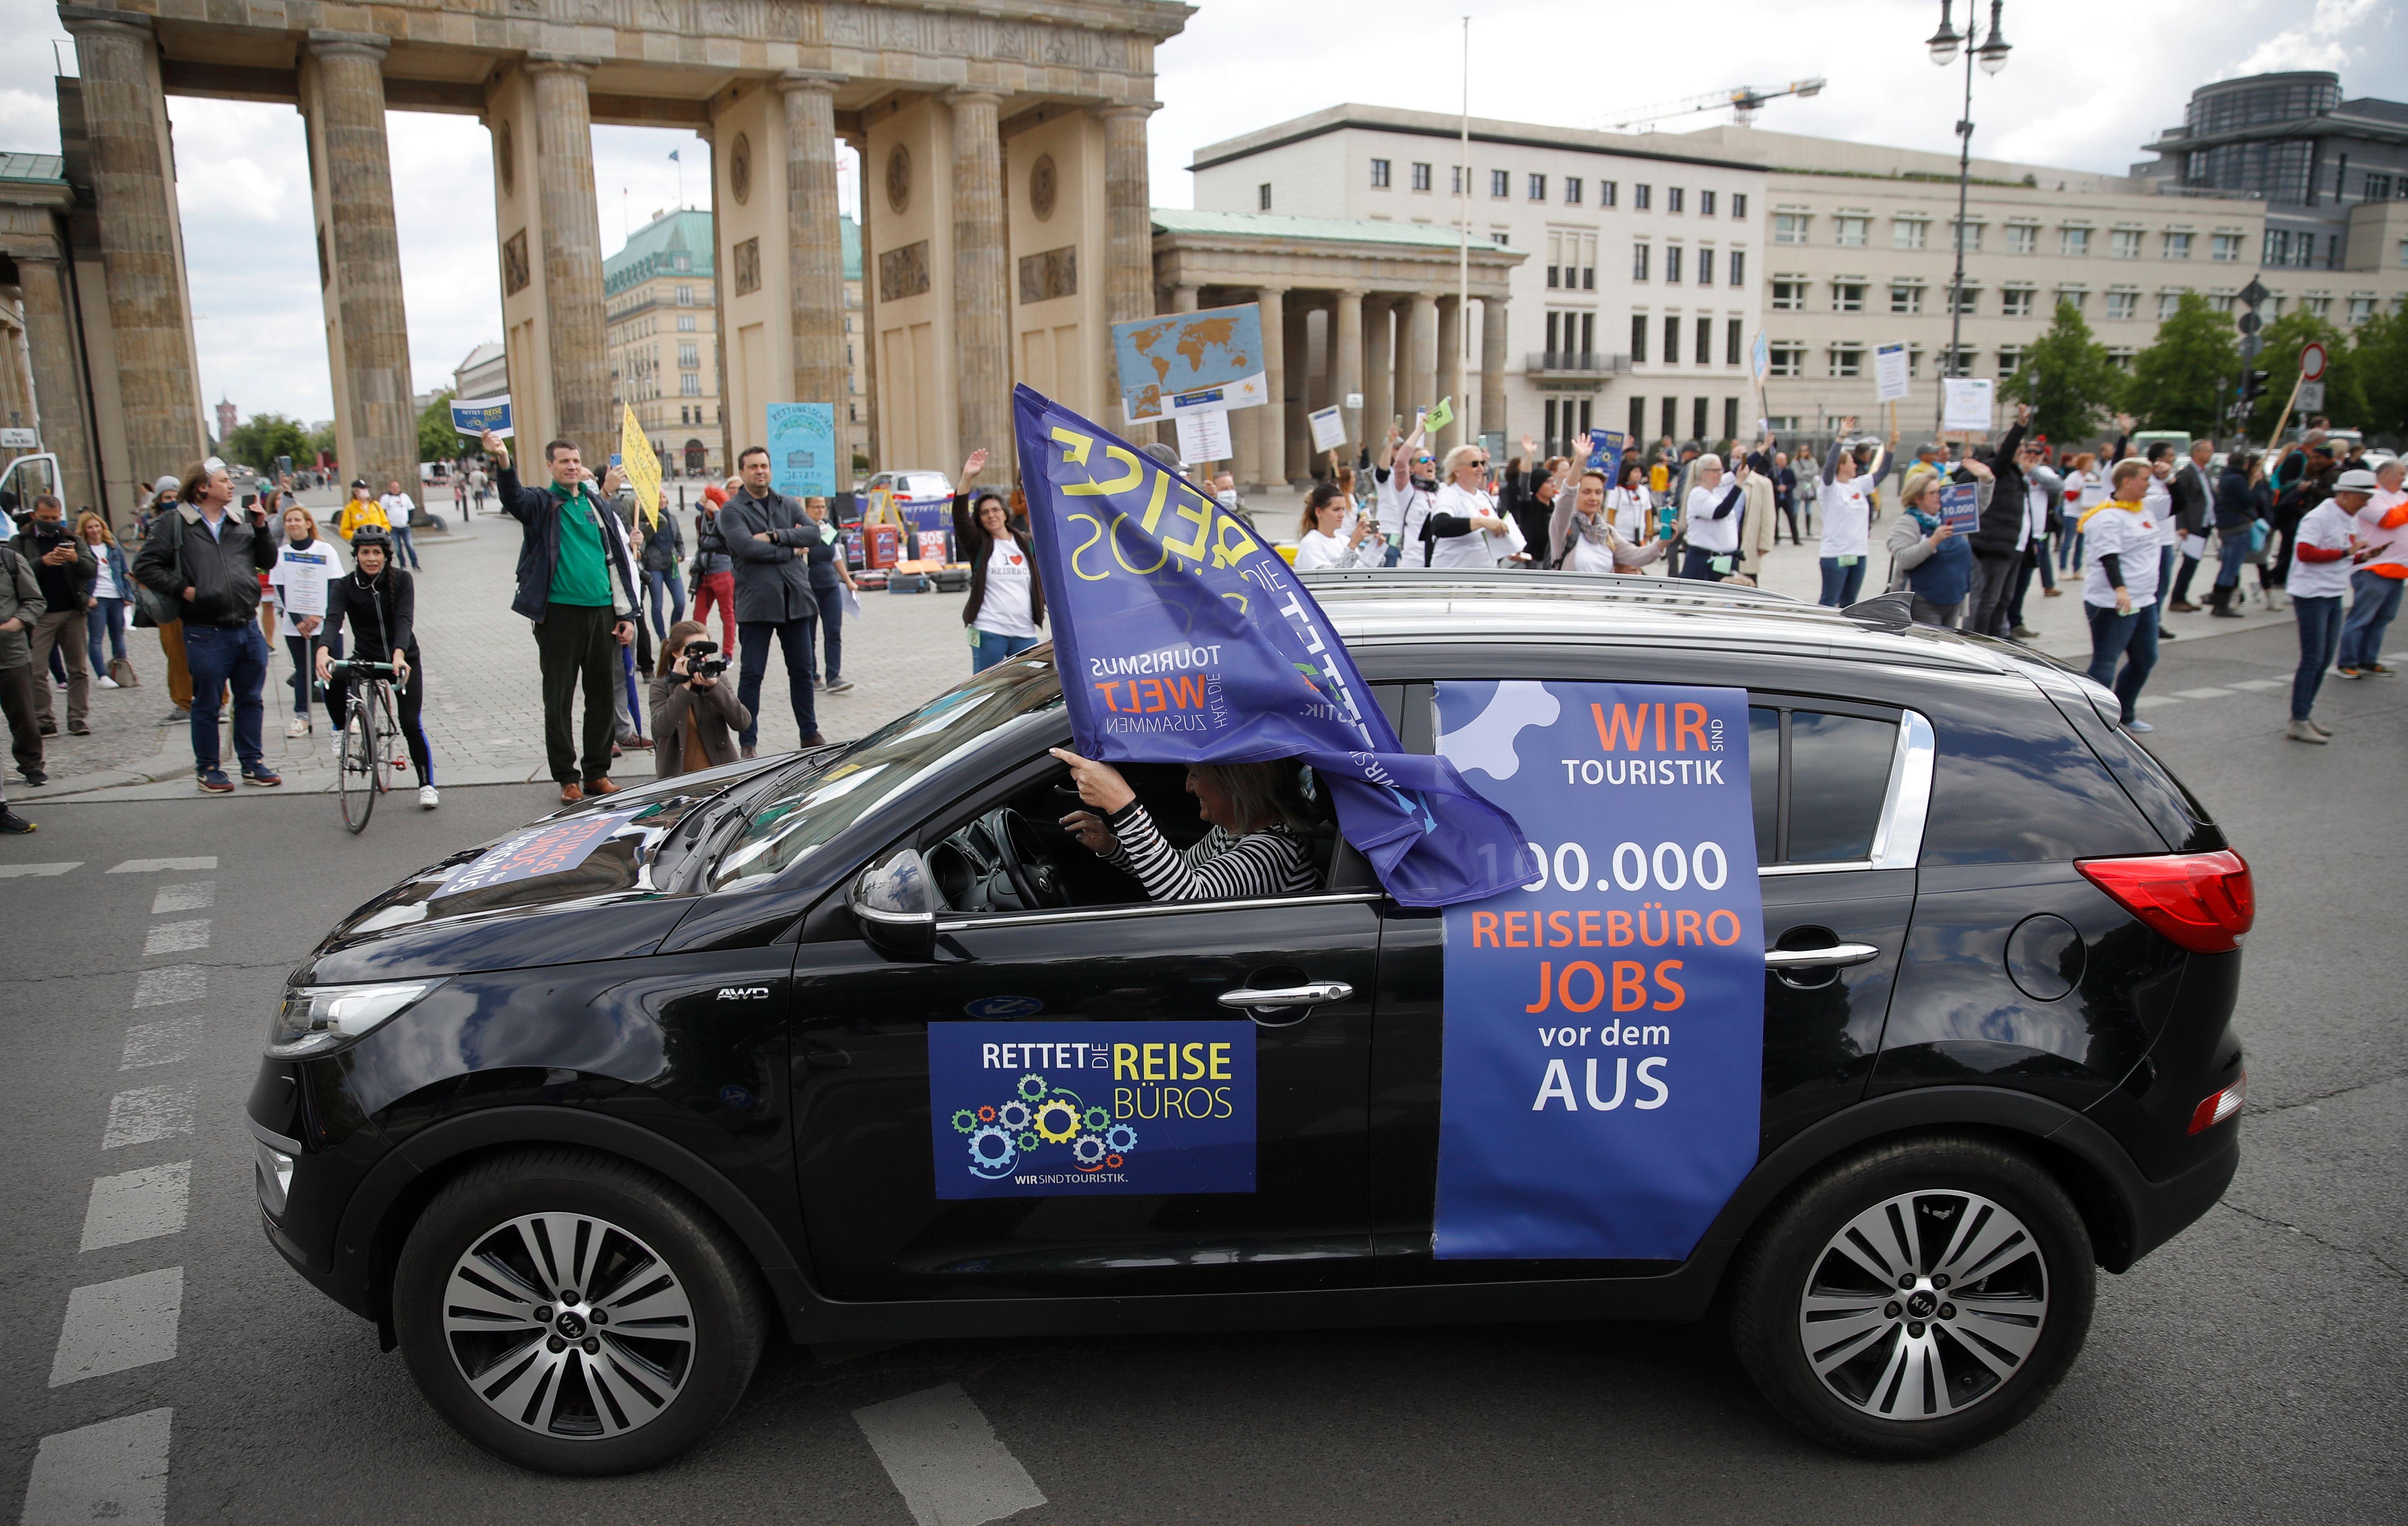 GERMANY-HEALTH-VIRUS-TOURISM-DEMO